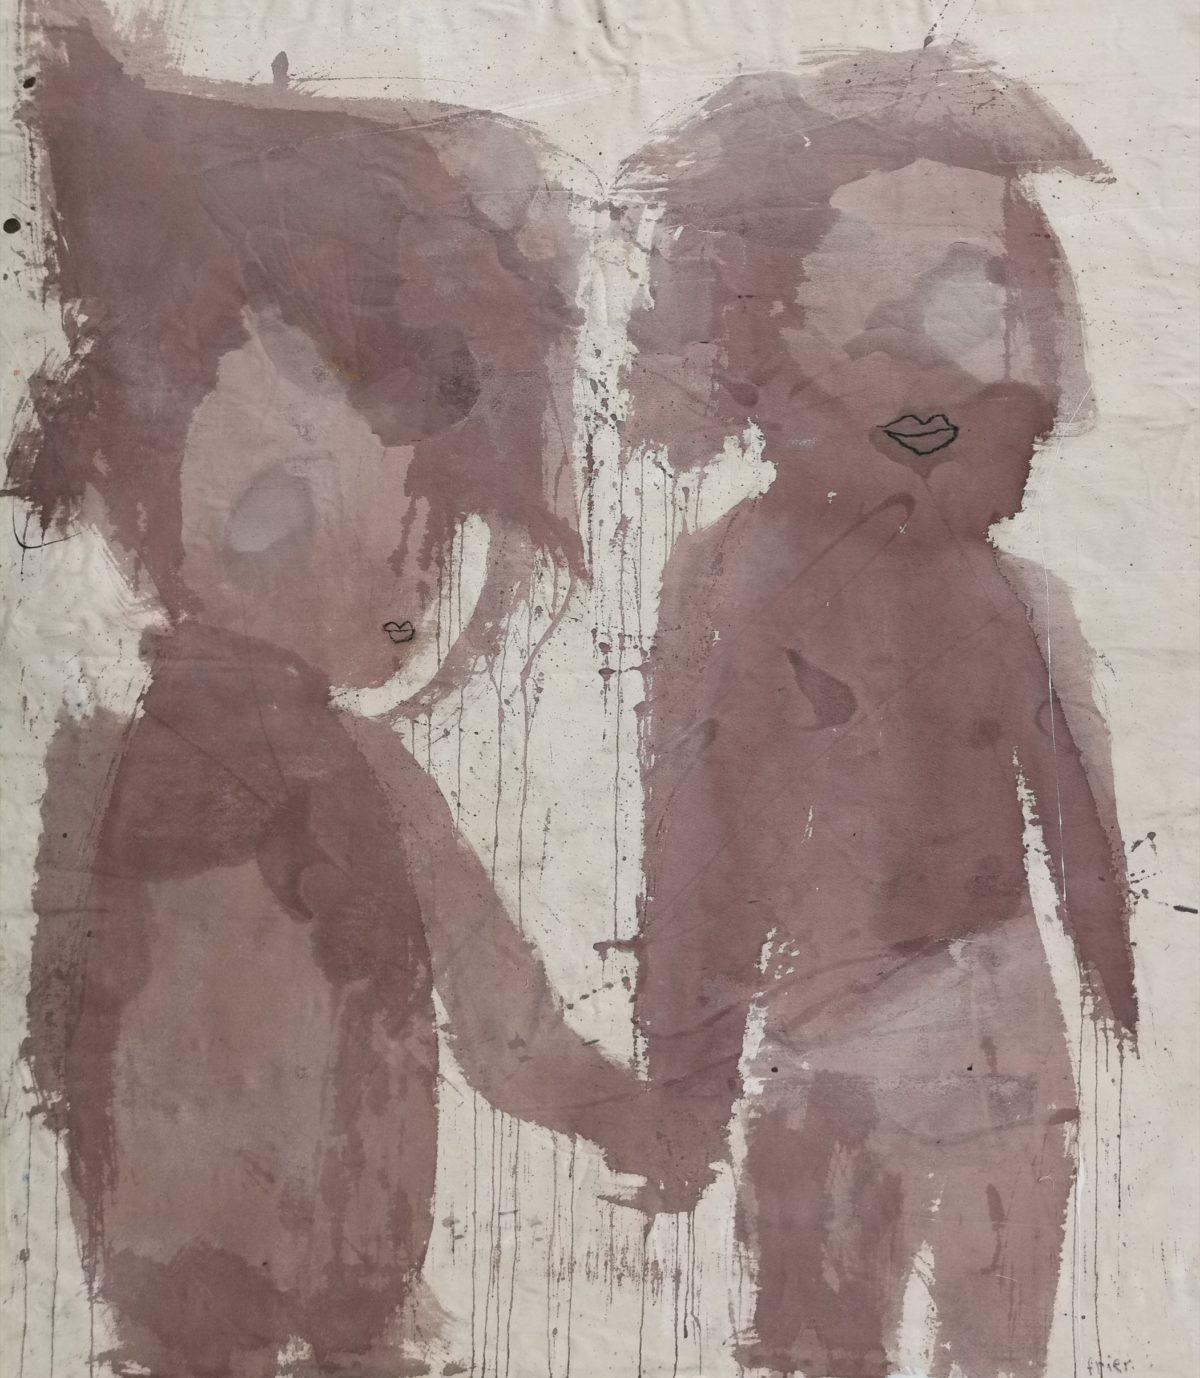 Juanita Frier - Love is 2018